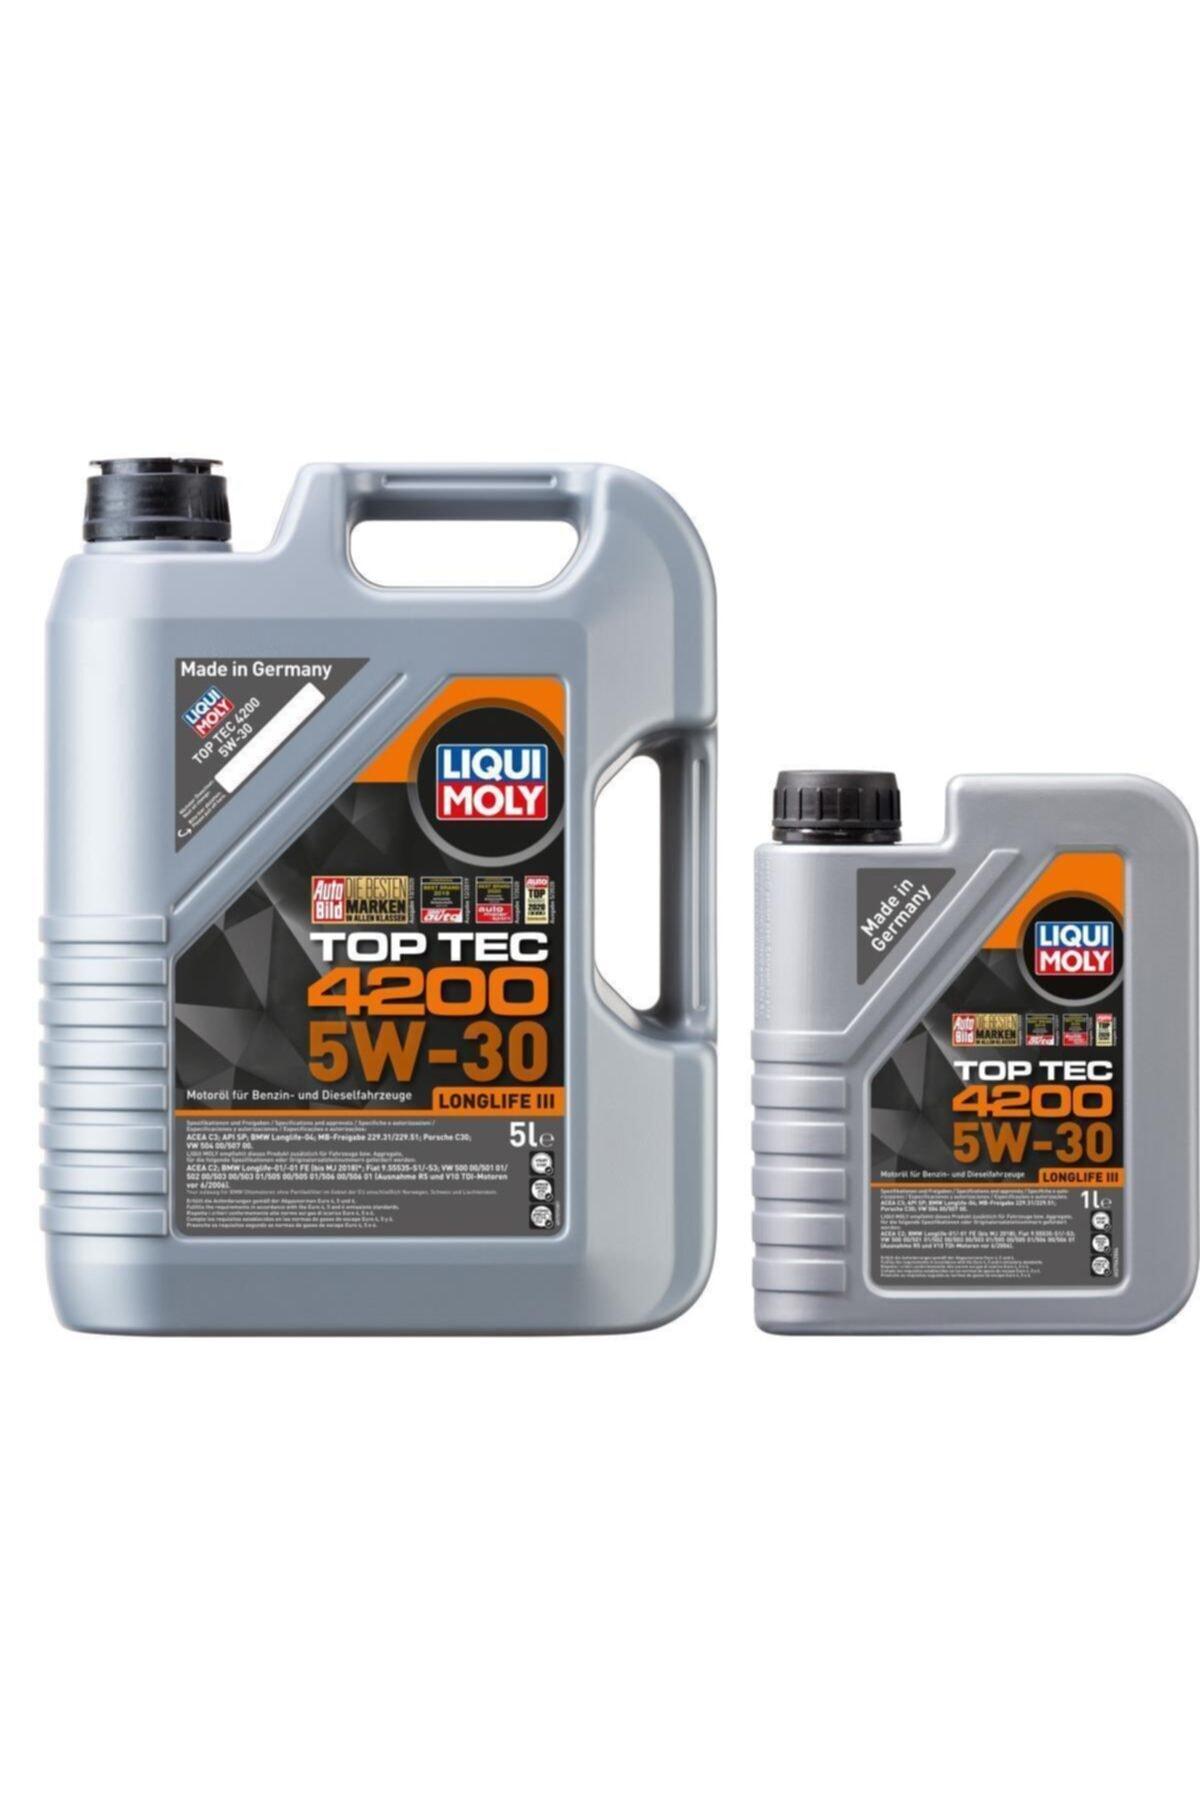 Liqui Moly Lıquı Moly 5w30 Motor Yağı Tam Sentetik Top Tec 4200 5+1 L 1